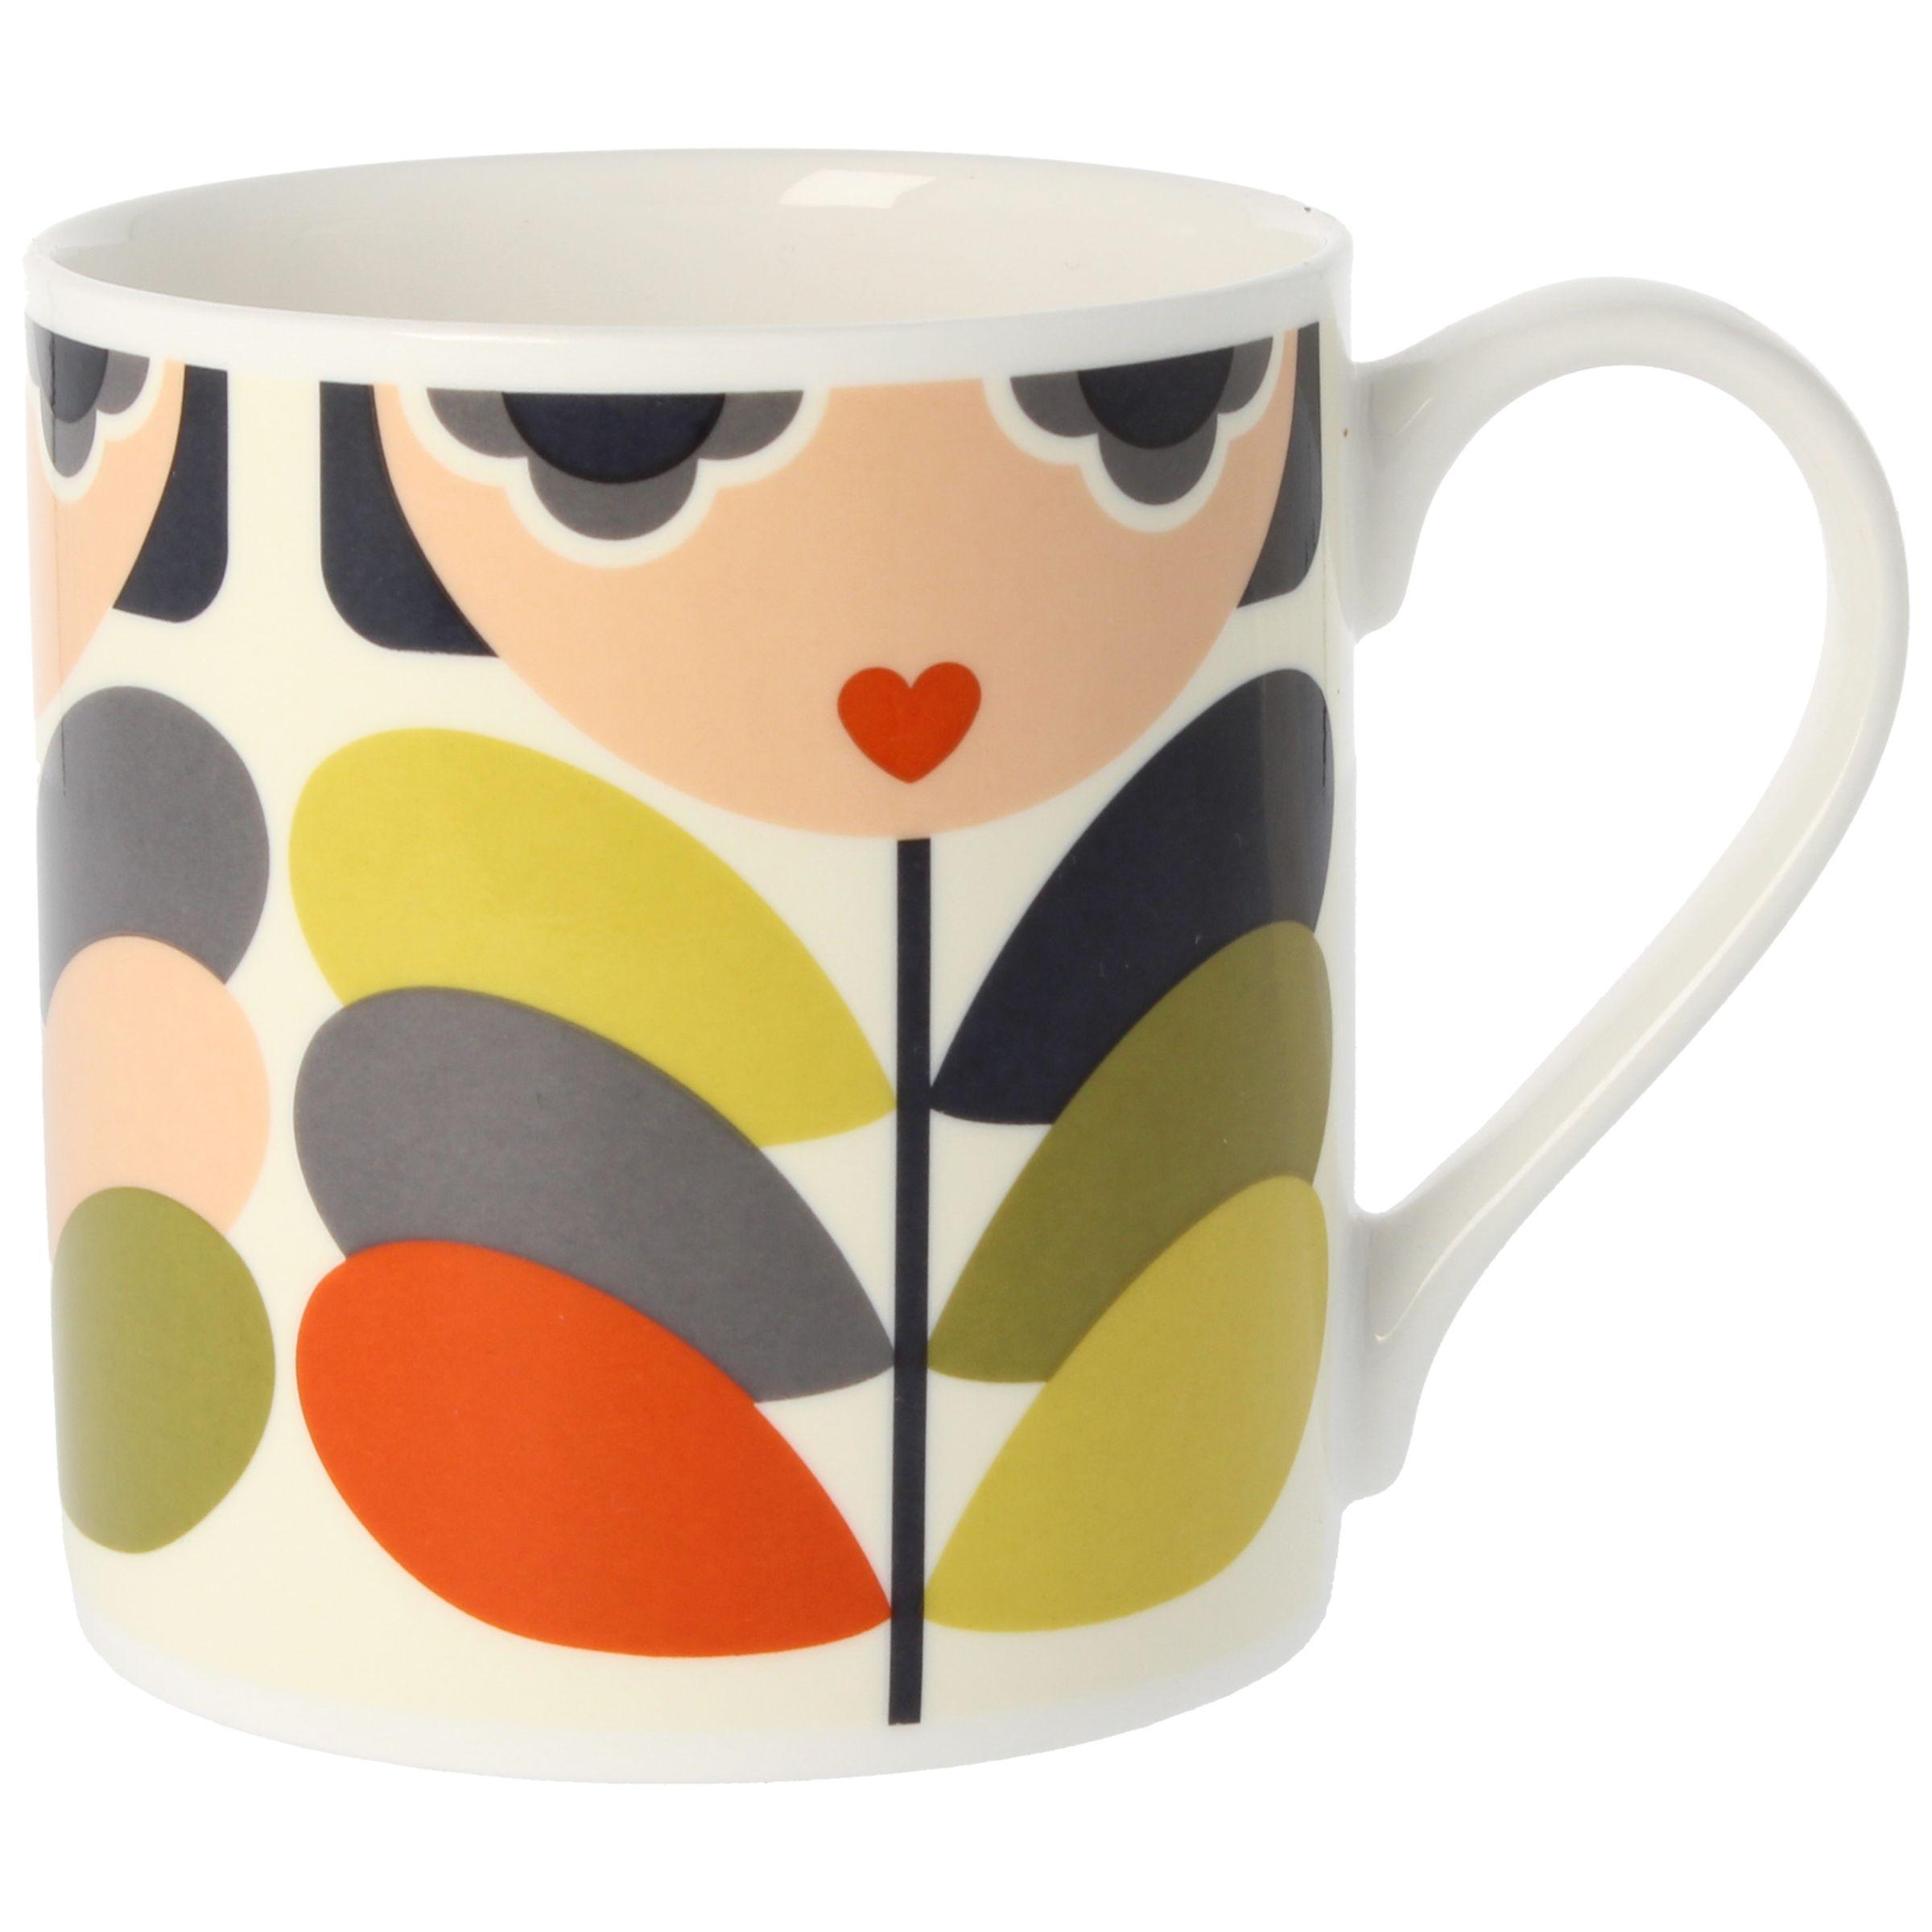 Orla Kiely Orla Kiely Lady Stem Mug, 350ml, Multi